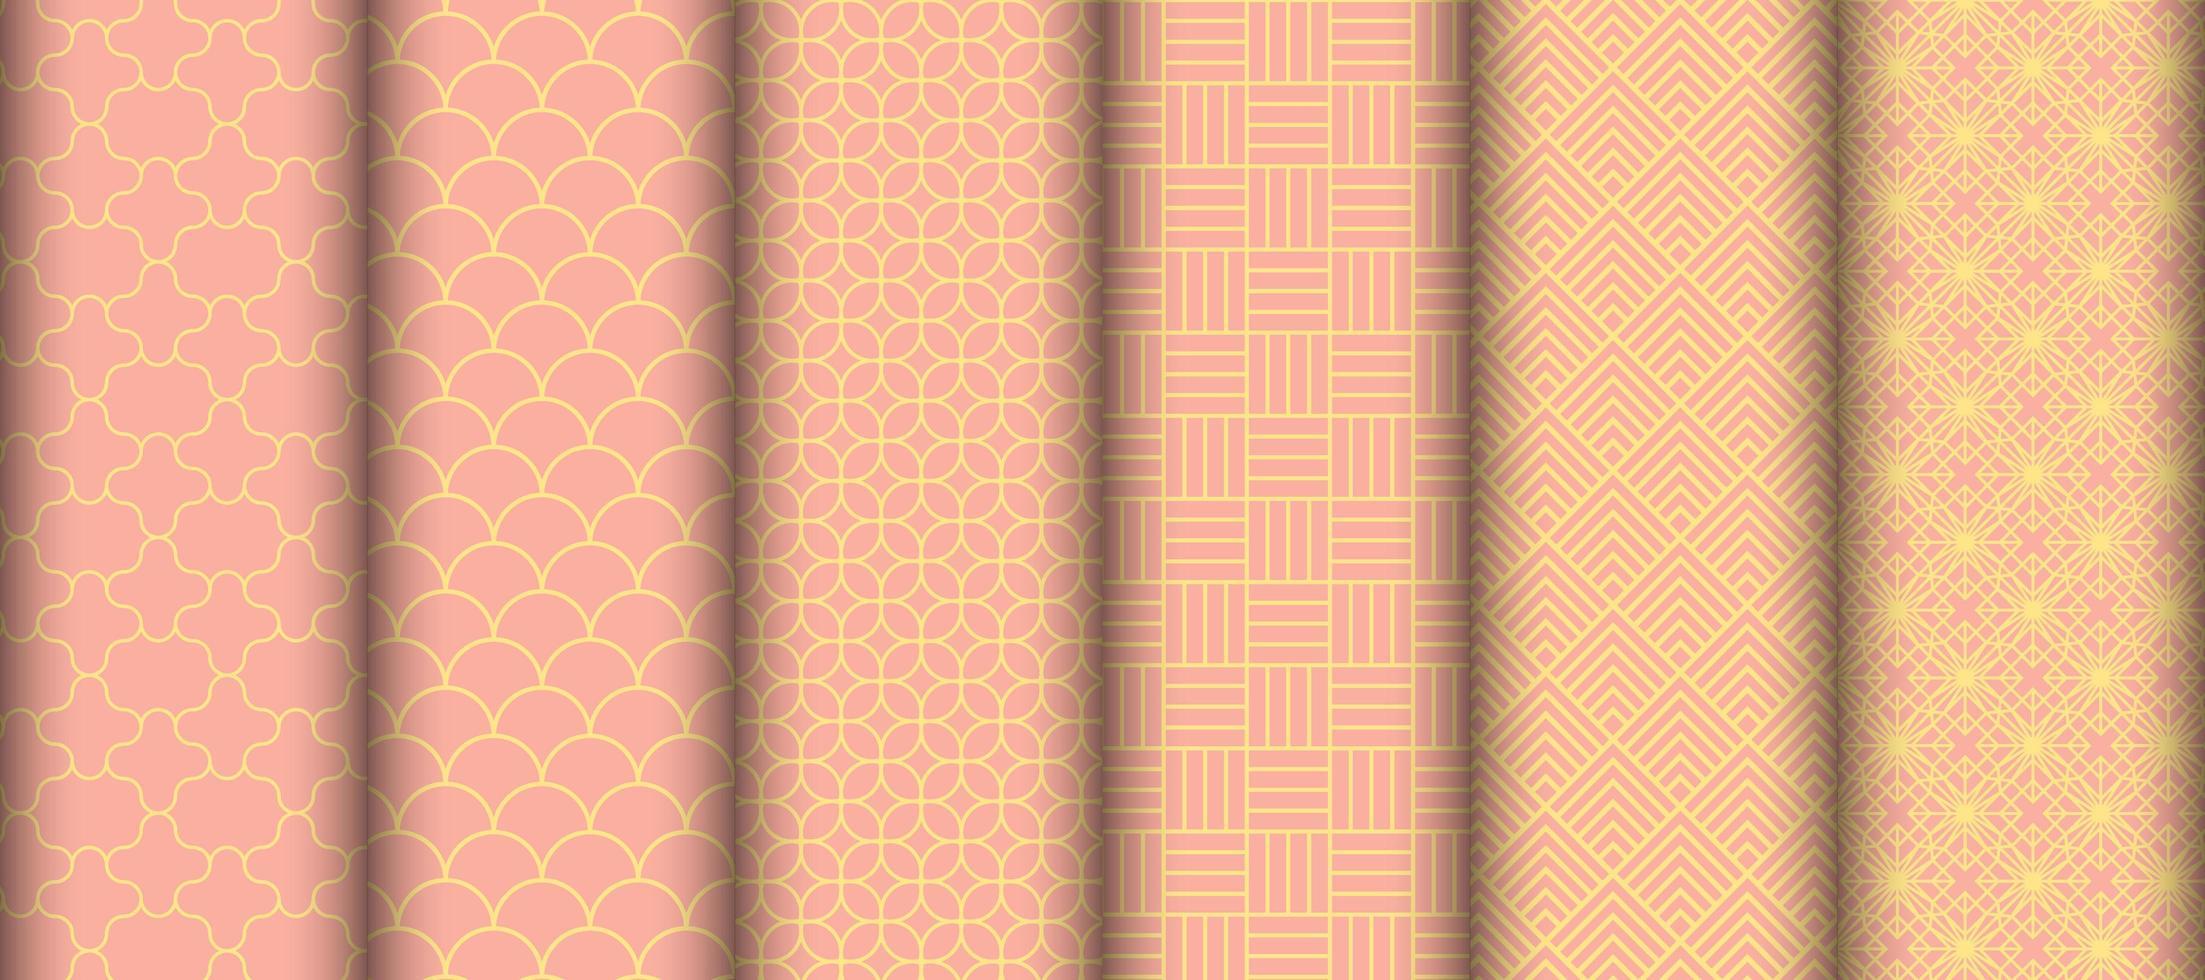 conjunto de padrões sem emenda de forma geométrica vetor